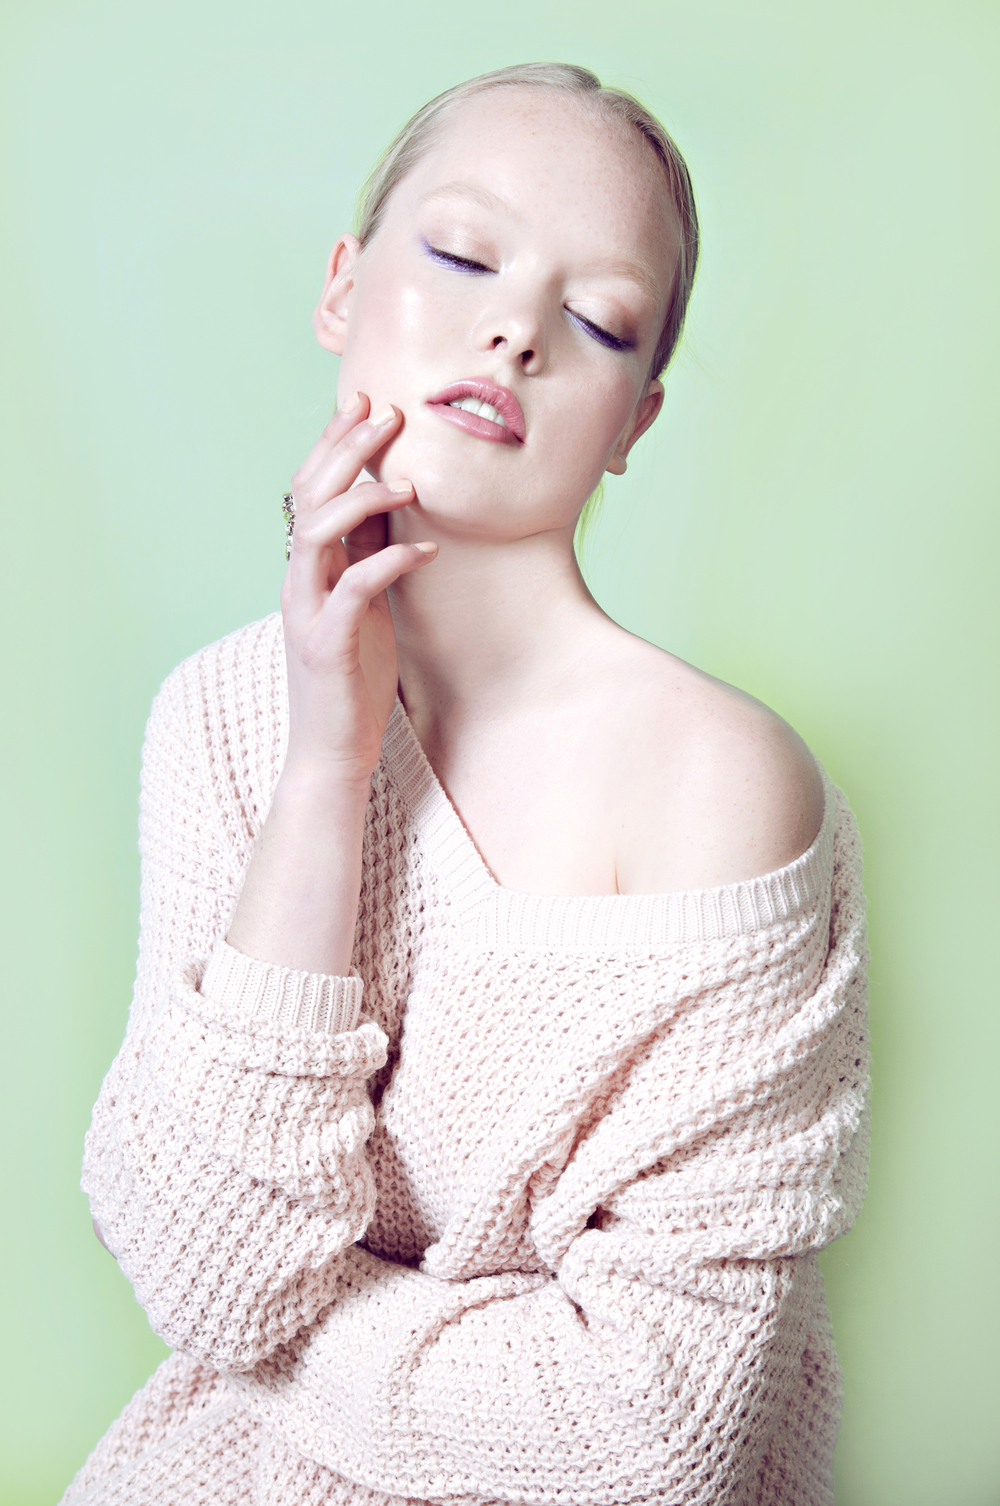 Vancouver-Makeup-Artist-Caragh-4.jpg